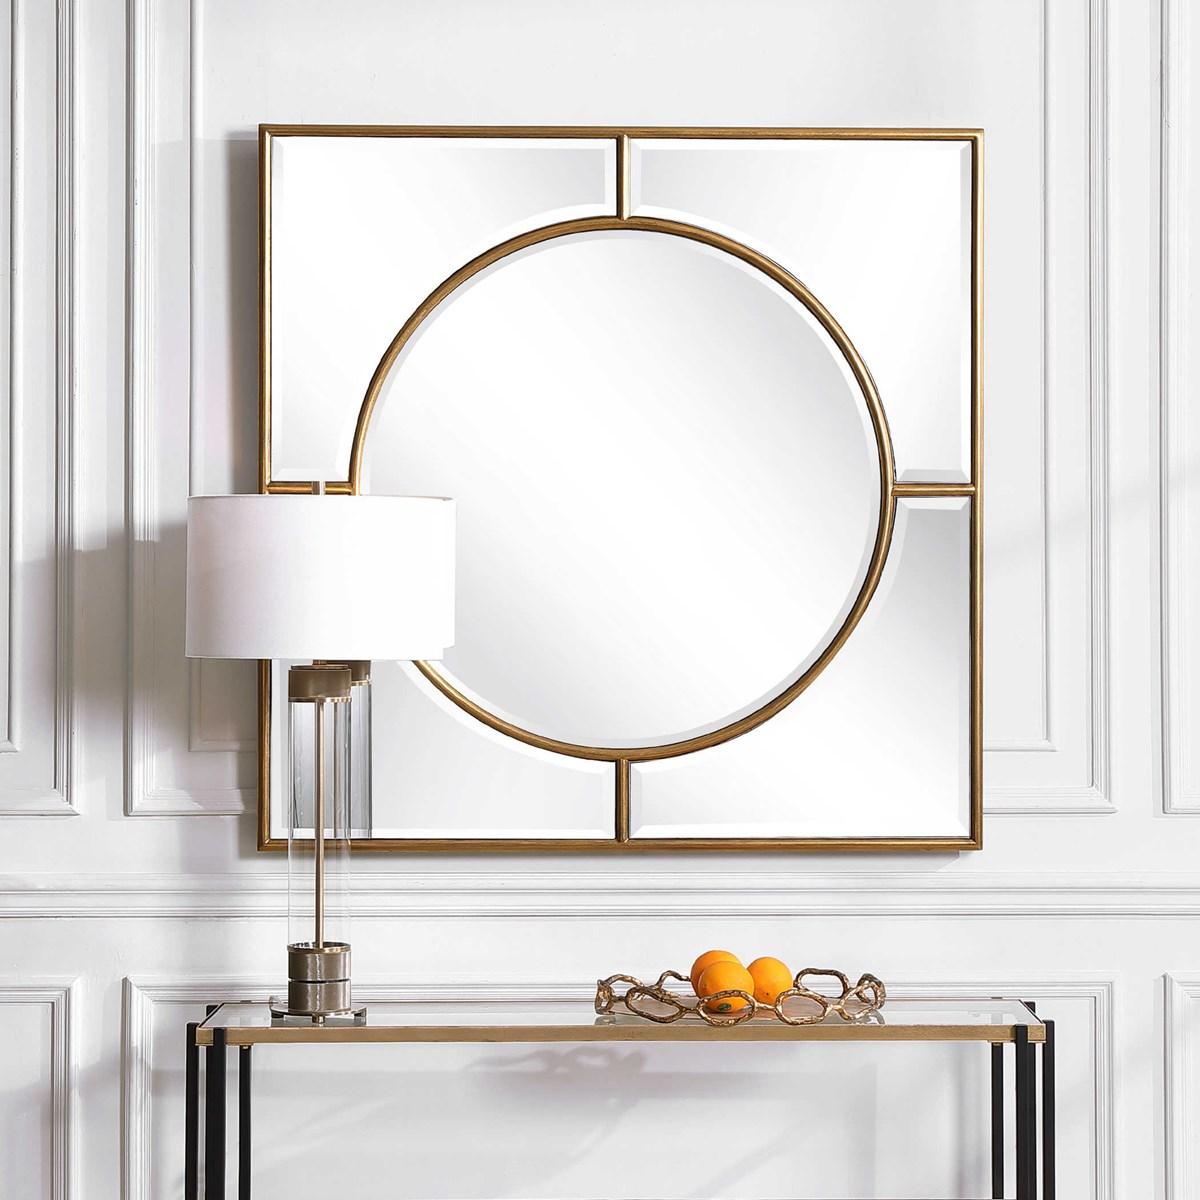 uttermost-stanford-square-mirror-gold-bullseye-round.jpg